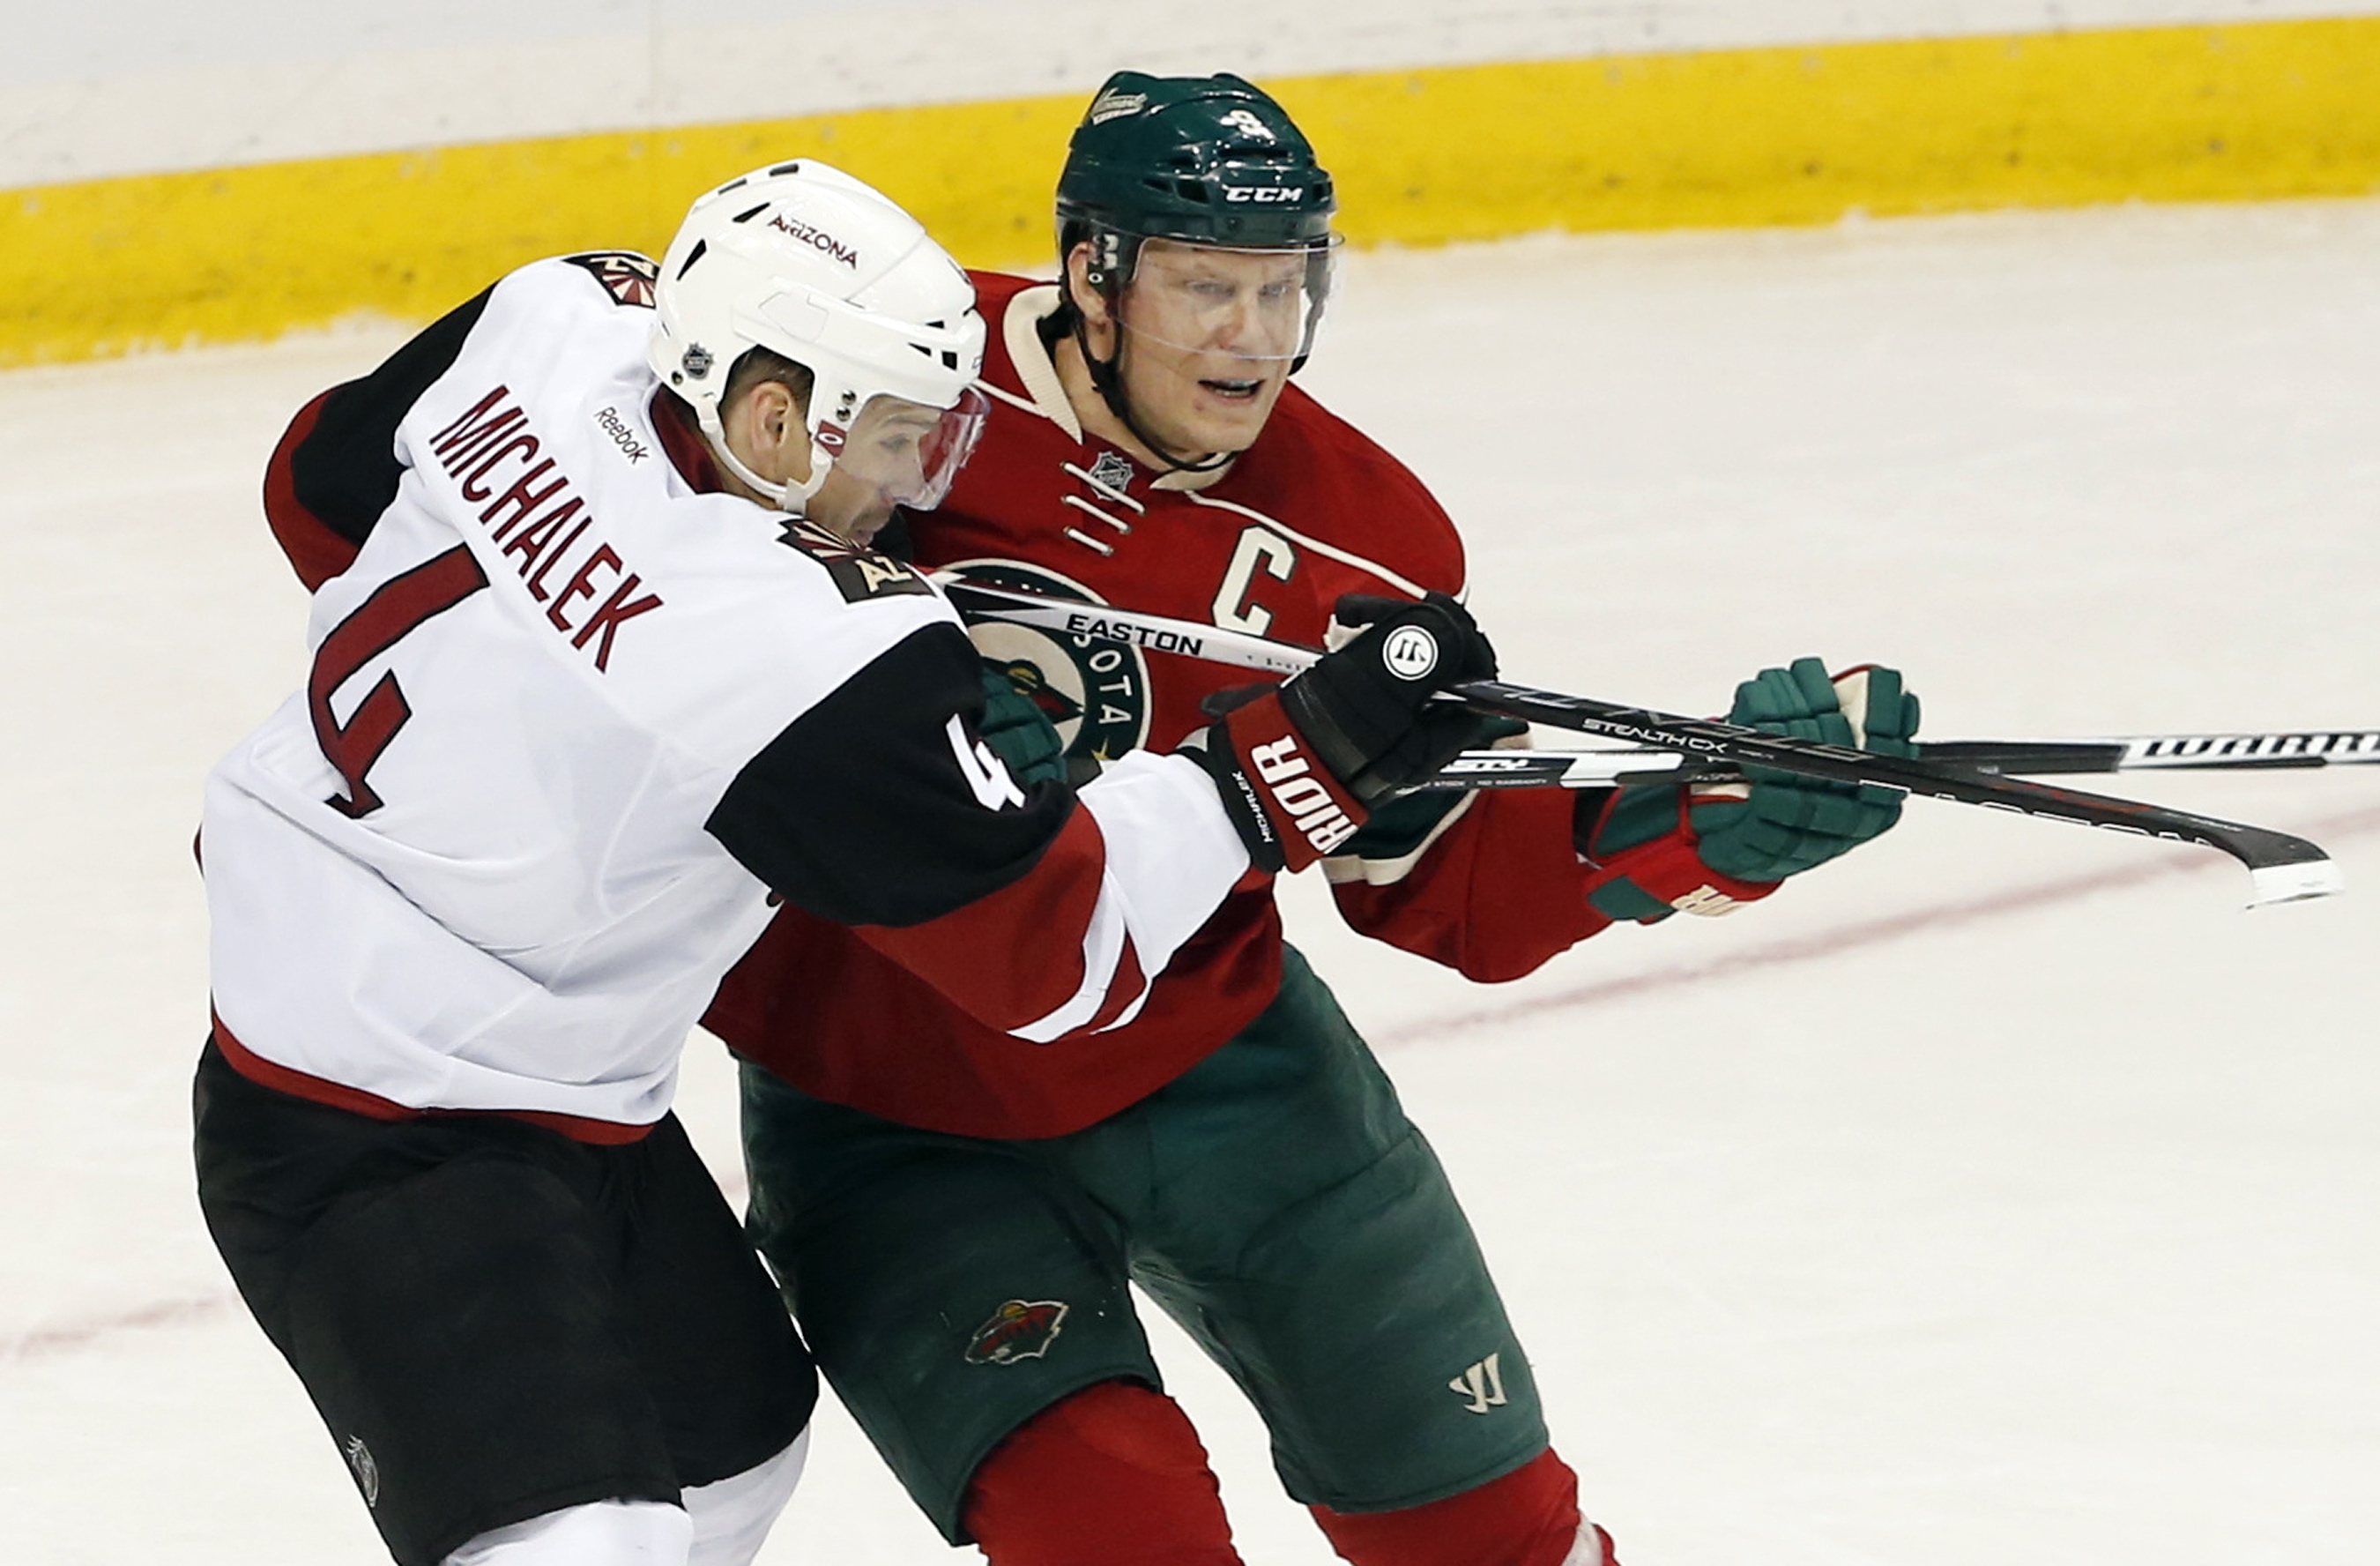 Arizona Coyotes' Zbynek Michalek, left, of Czech Republic, impedes Minnesota Wild's Mikko Koivu, of Finland, in the first period  of an NHL hockey game, Monday, Jan. 25, 2016, in St. Paul, Minn. (AP Photo/Jim Mone)